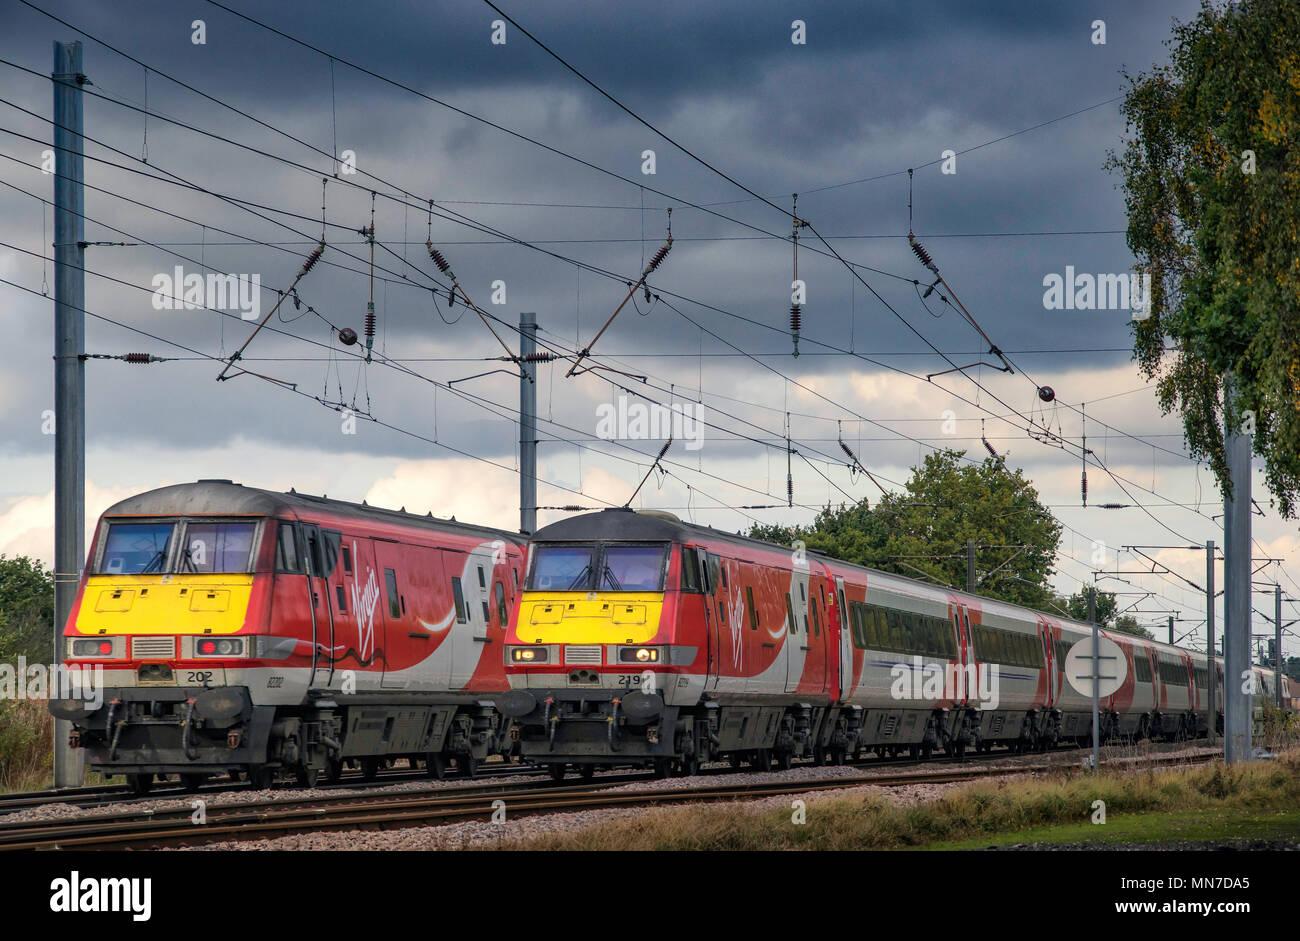 Virgin Trains - Stock Image